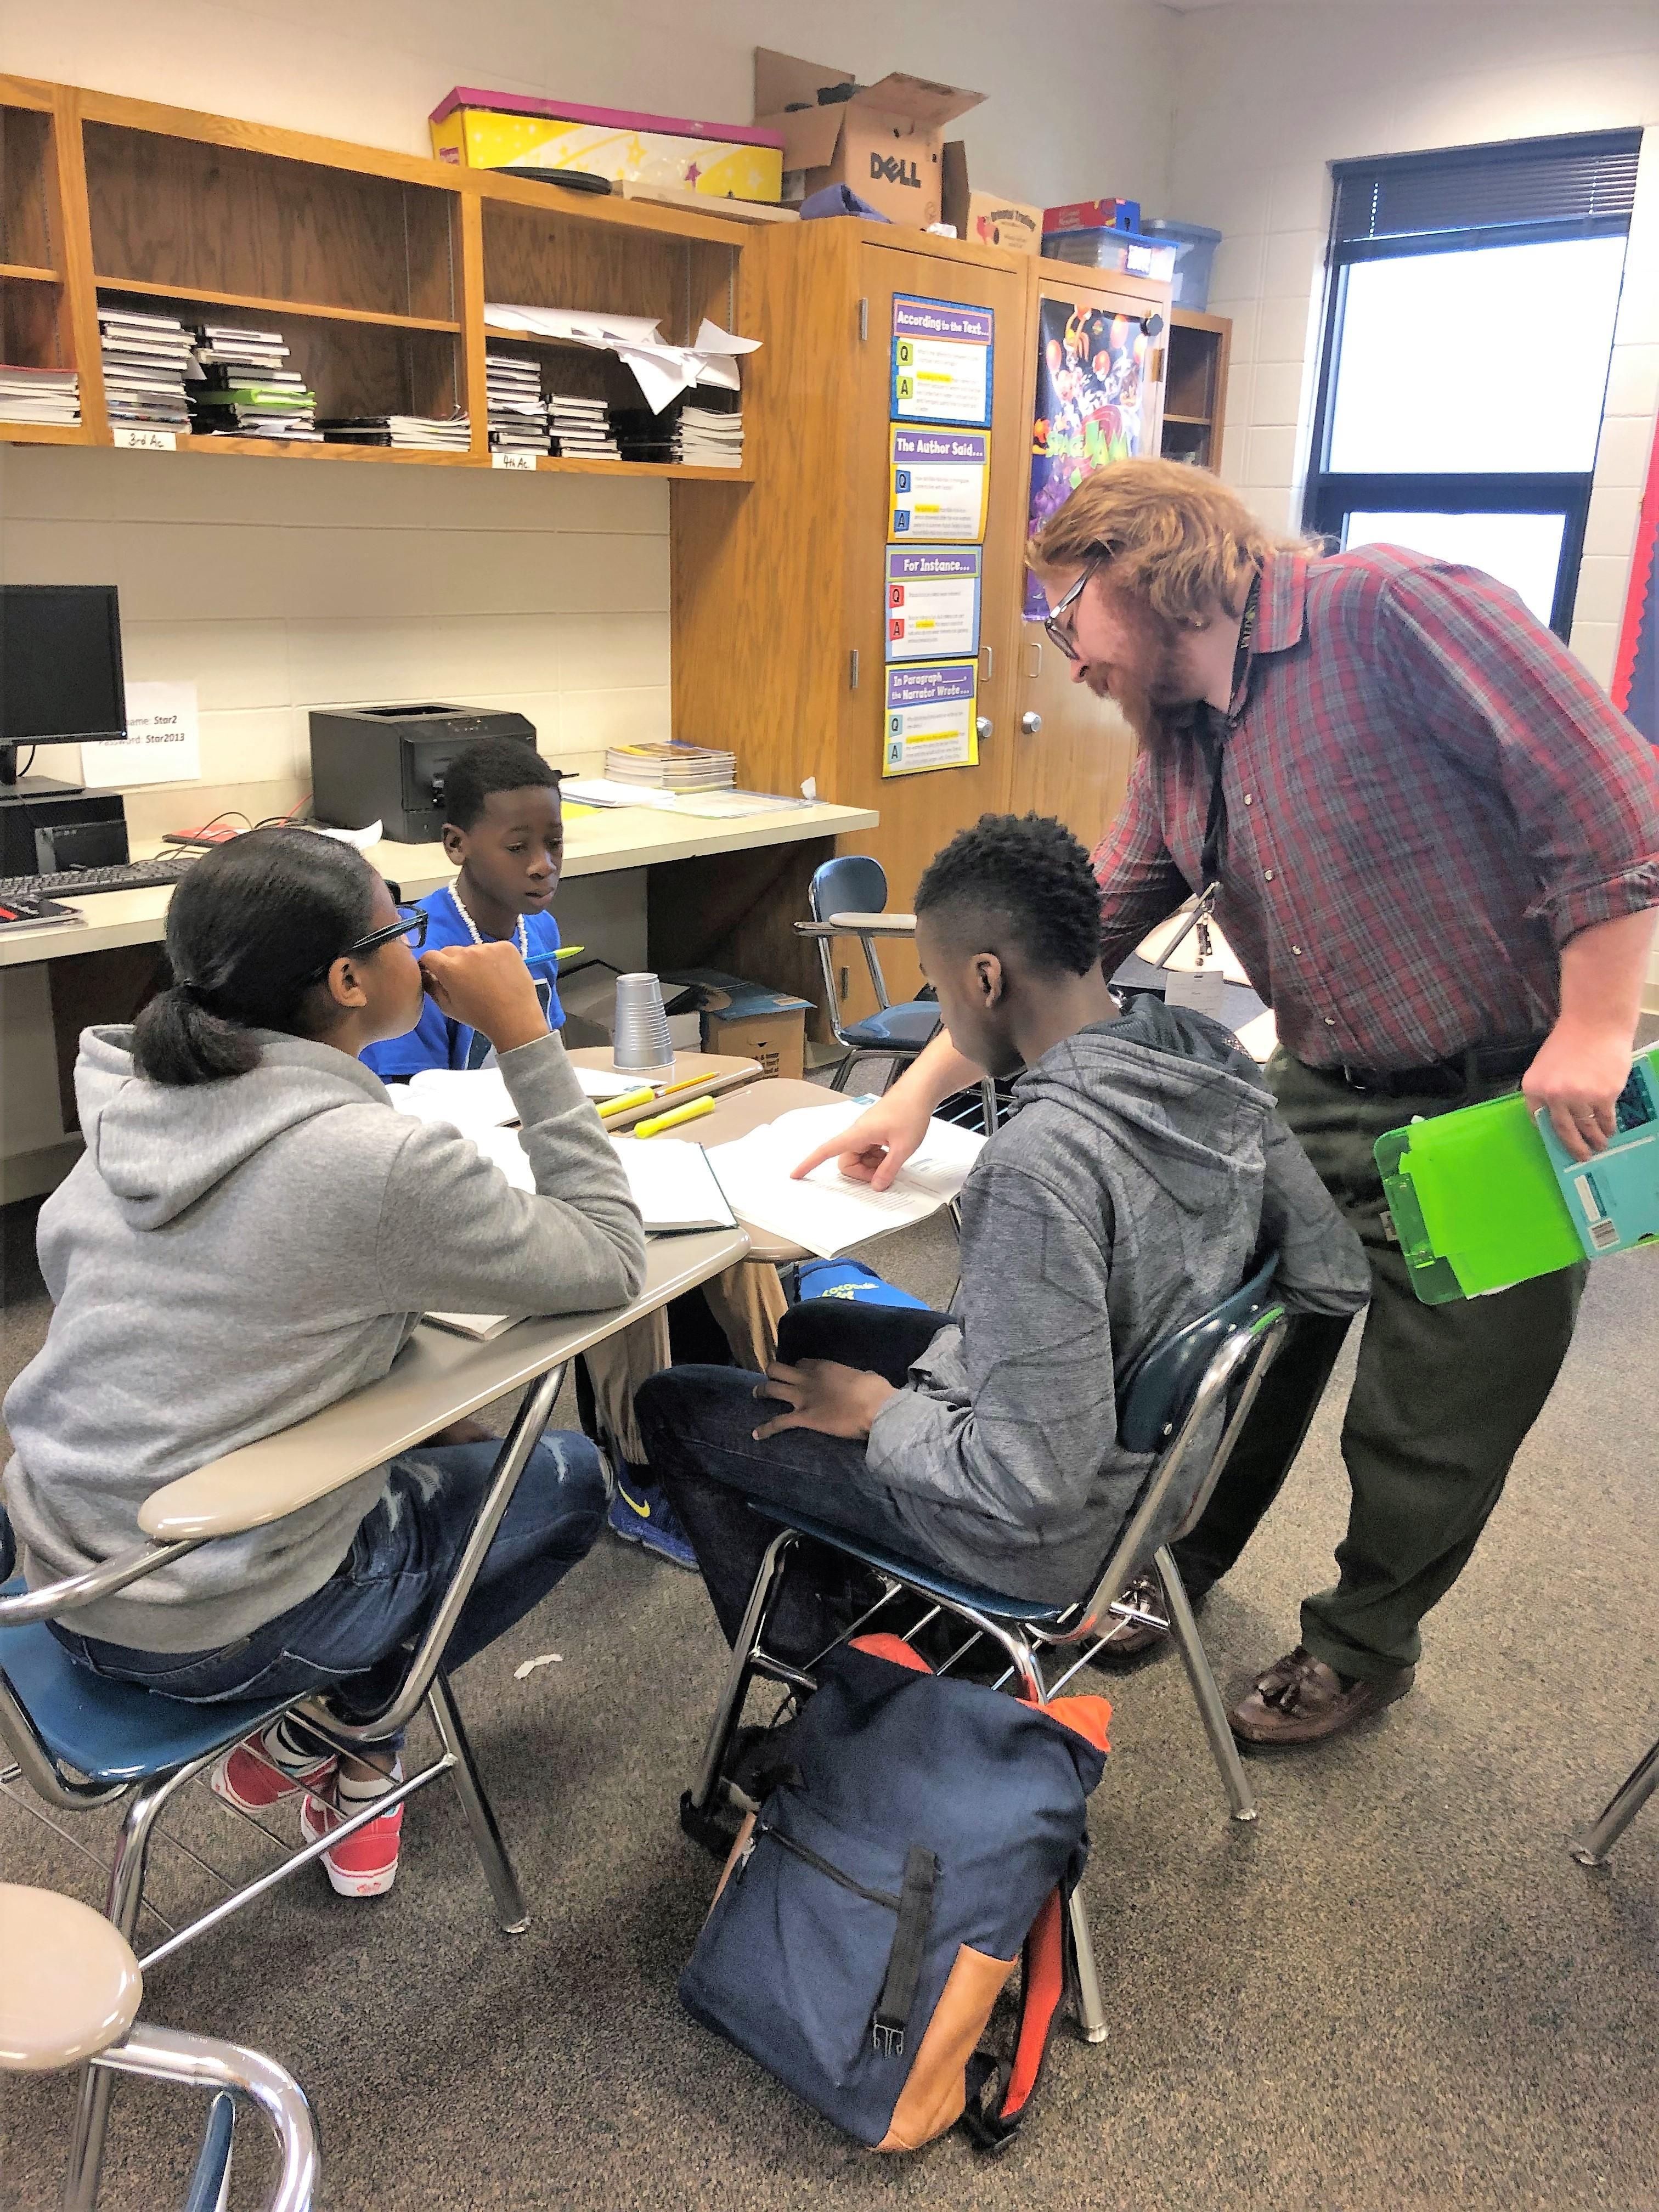 Teacher facilitating student-centered instruction